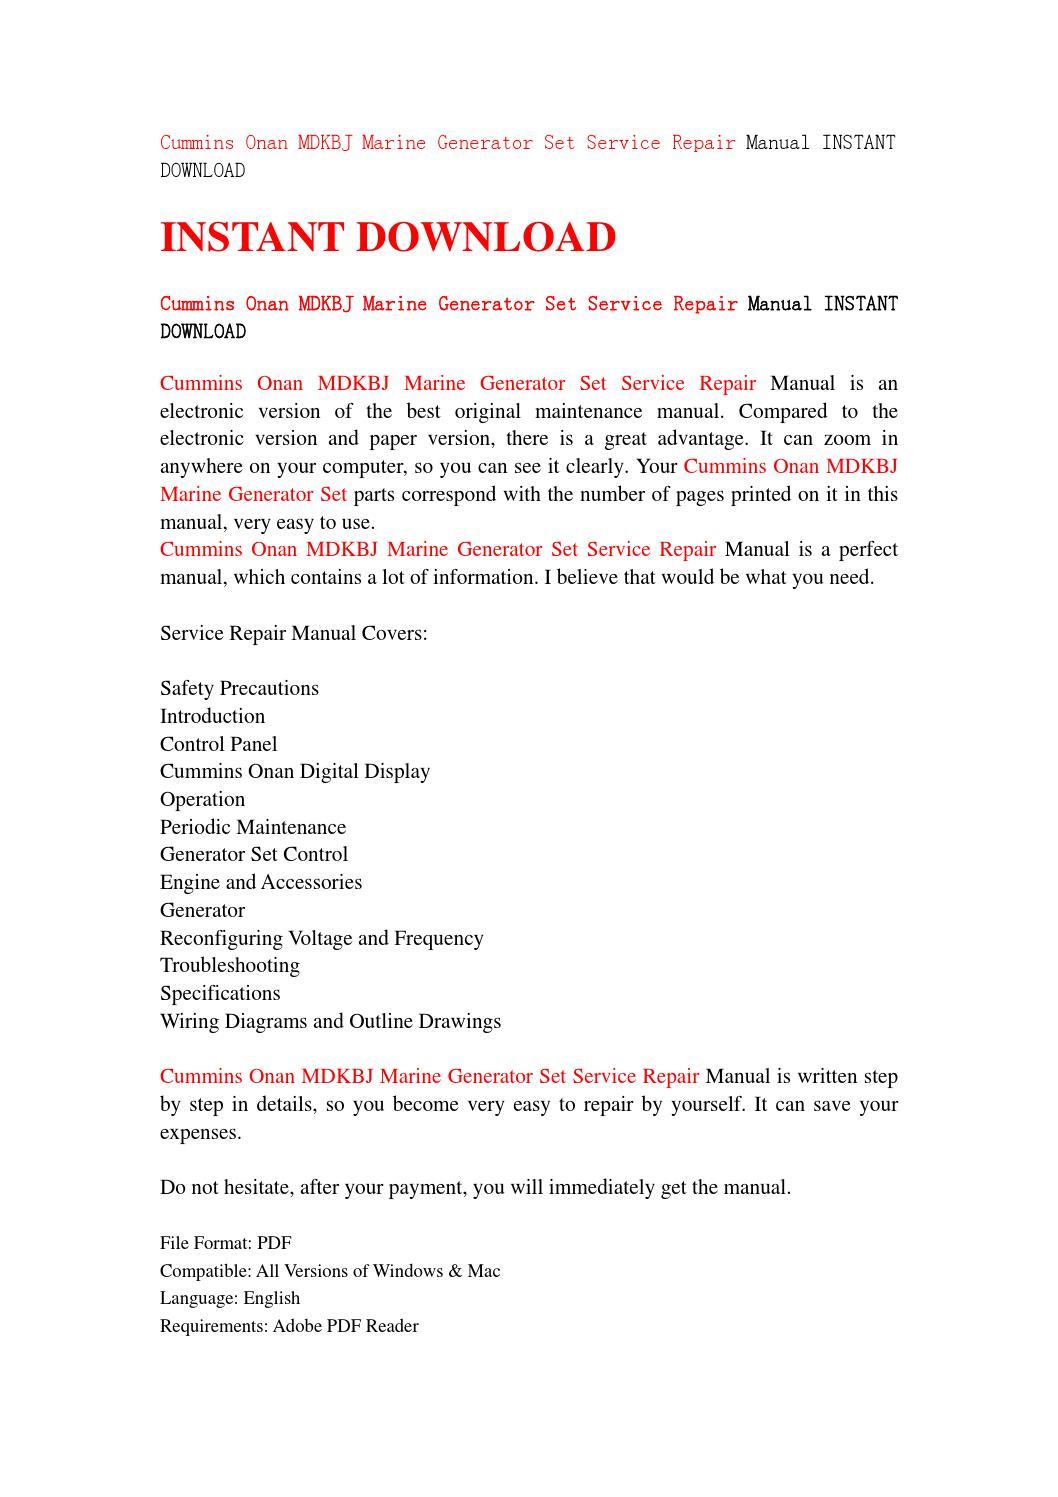 ... Array - cummins onan mdkbj marine generator set service repair manual  rh issuu com